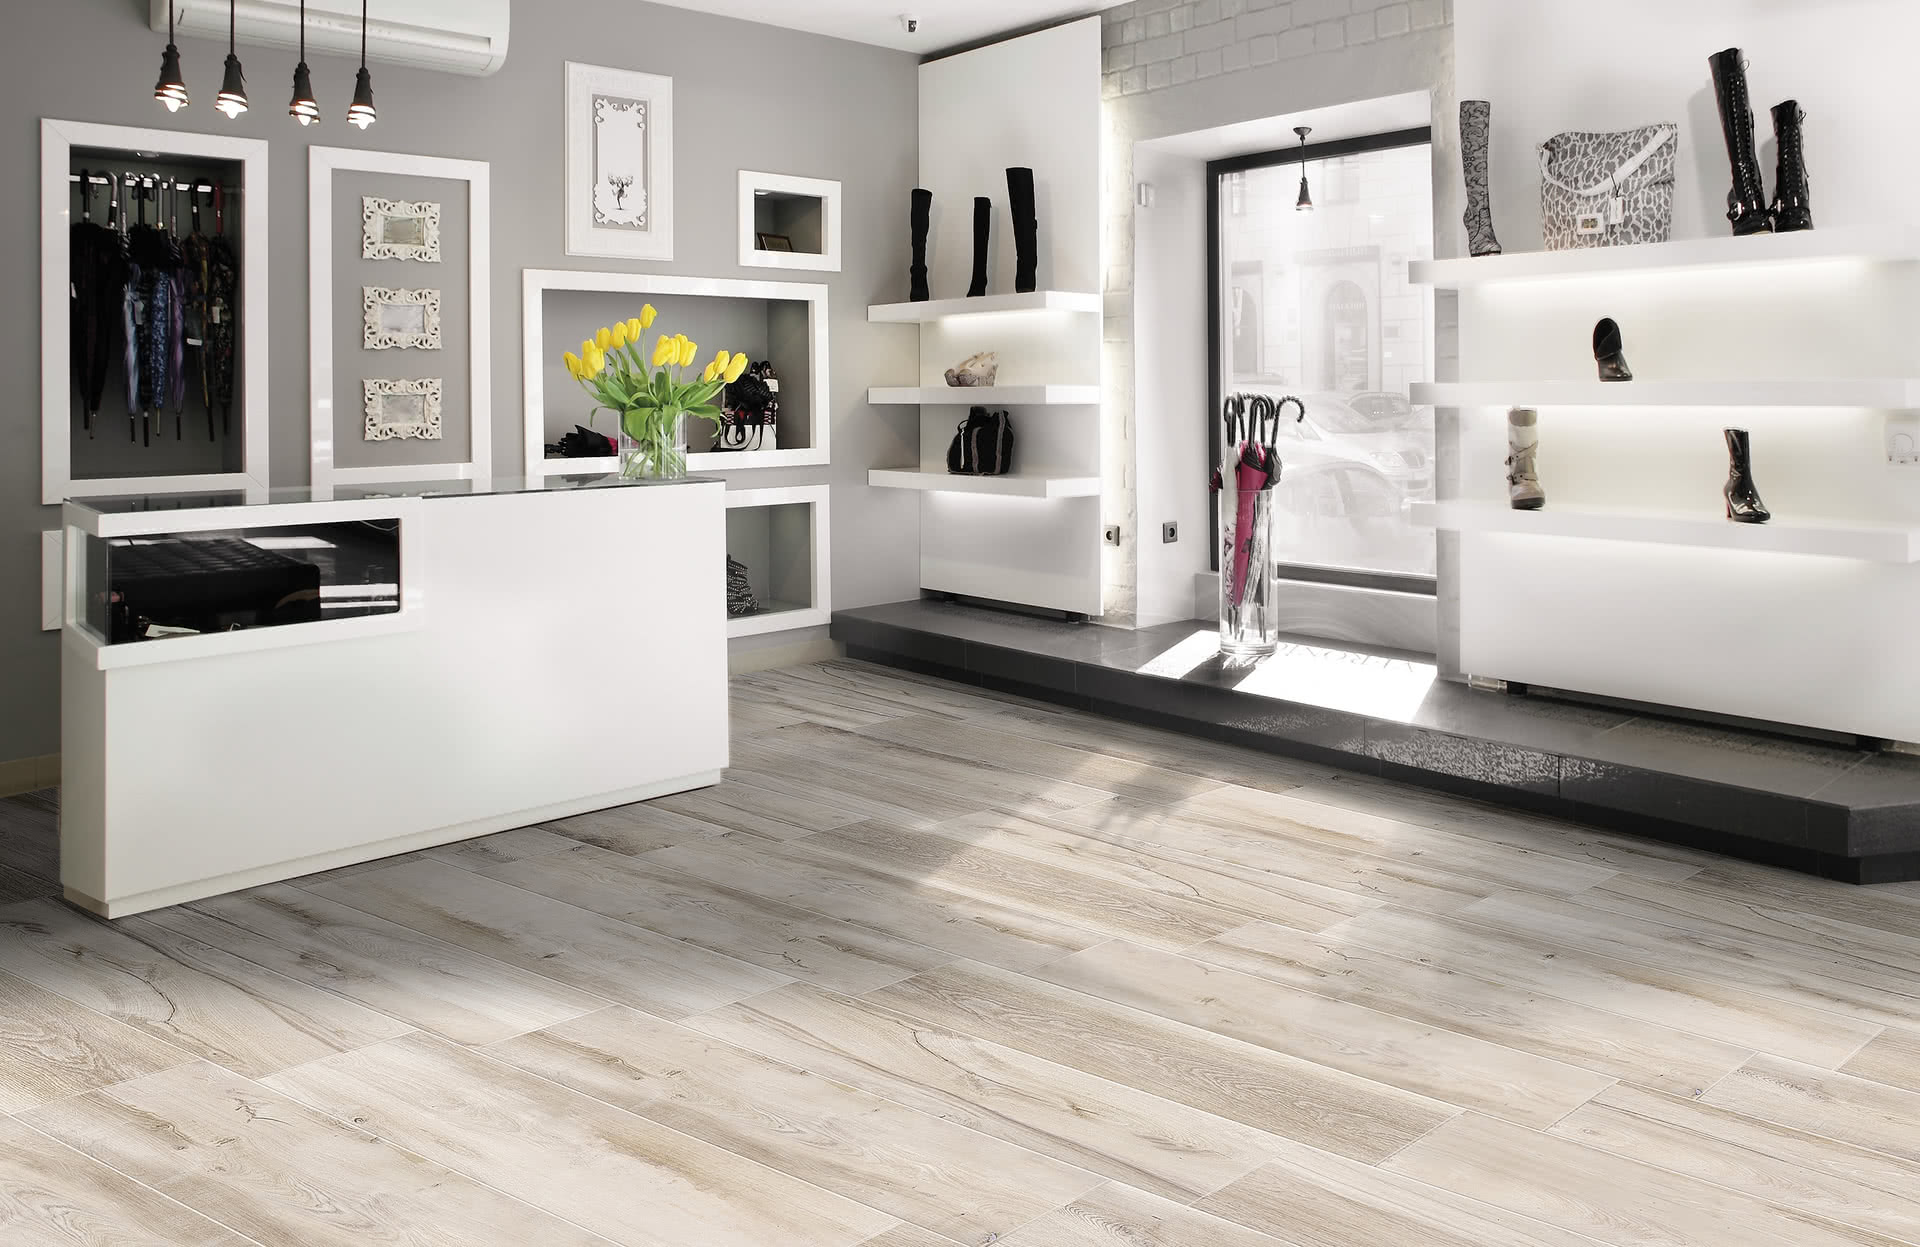 tile stores in rhode island ri where